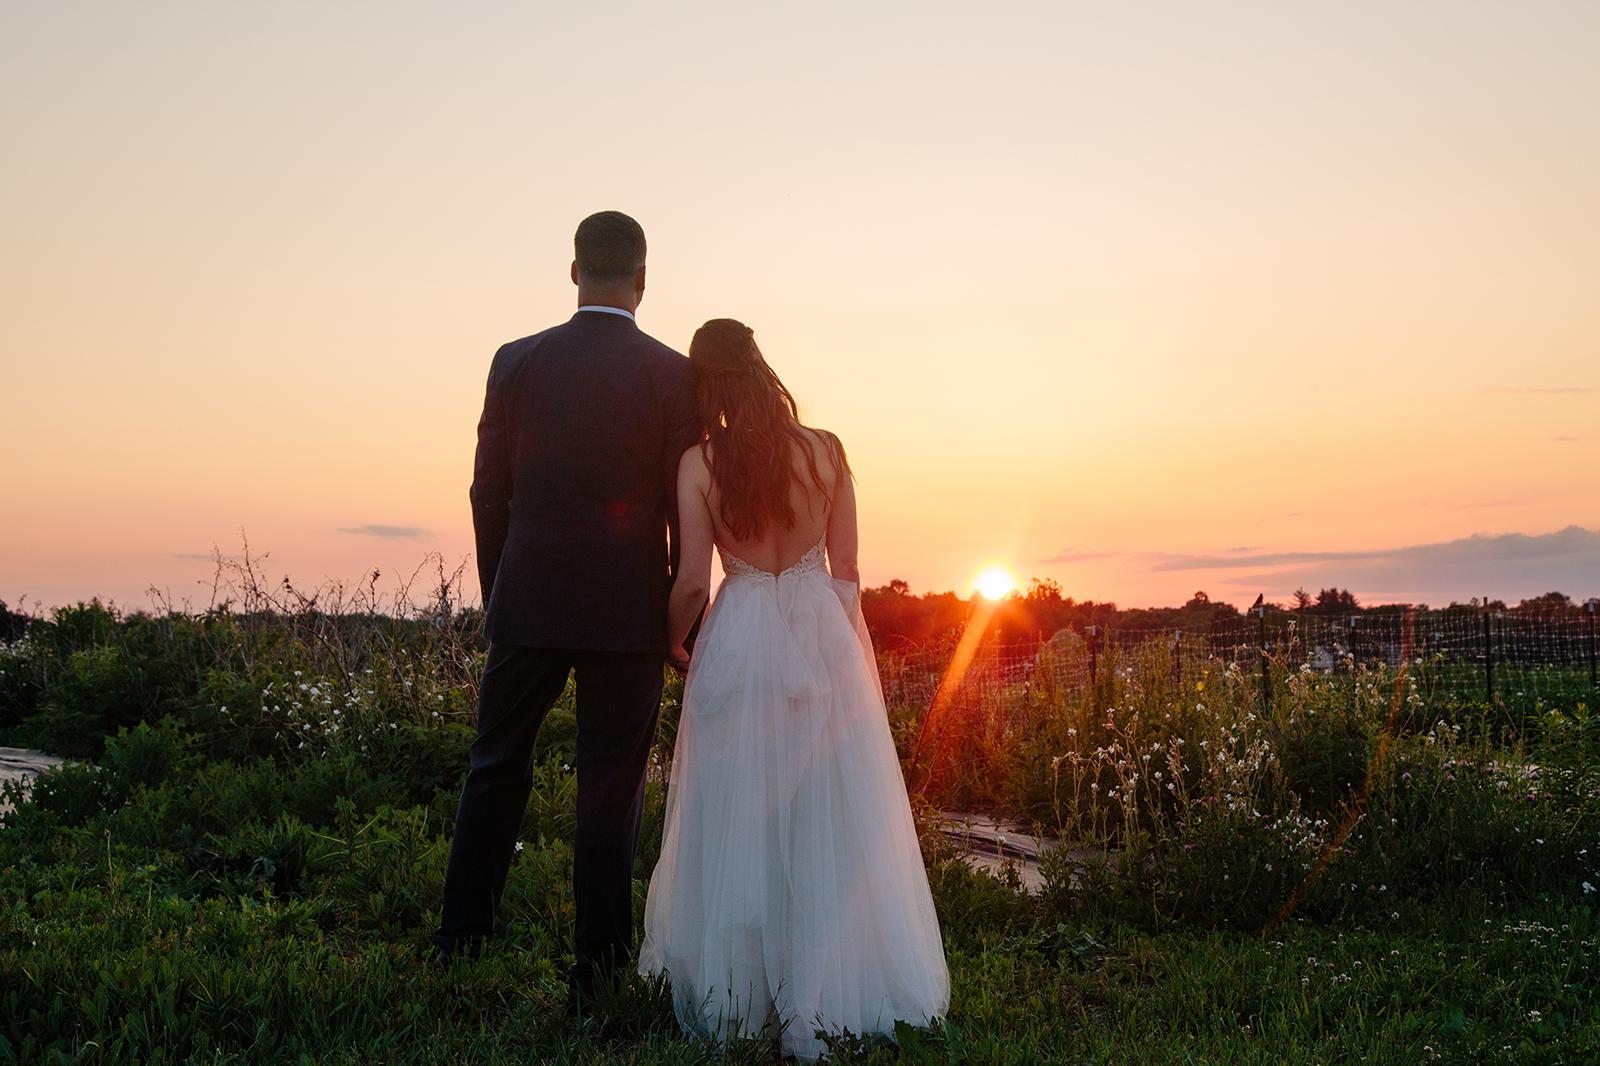 wedding photographer.jpg